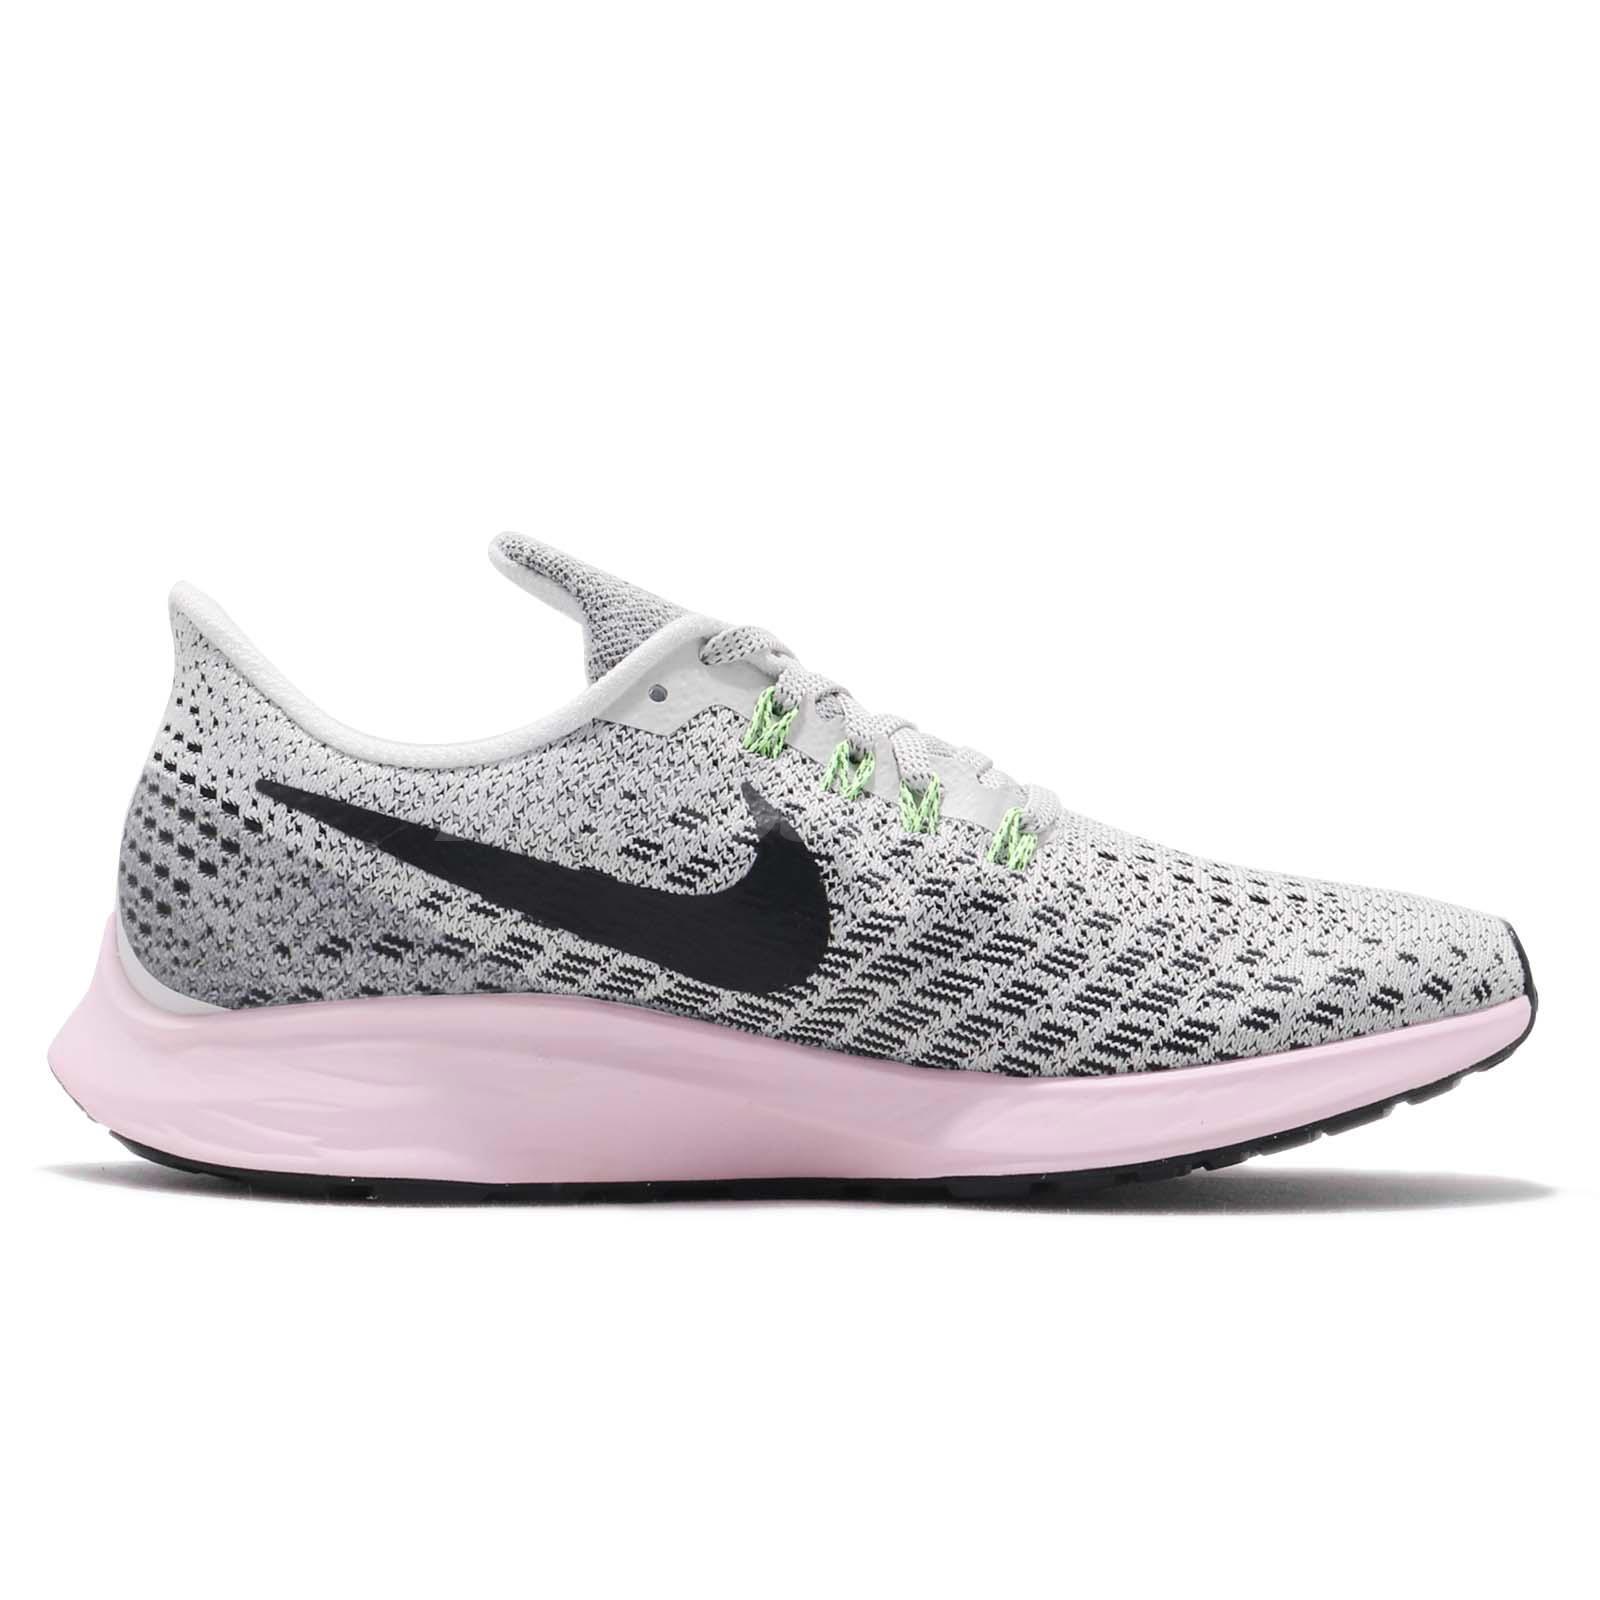 pick up d4e73 9a456 Details about Nike Wmns Air Zoom Pegasus 35 Vast Grey Black Pink Women  Running Shoe 942855-011